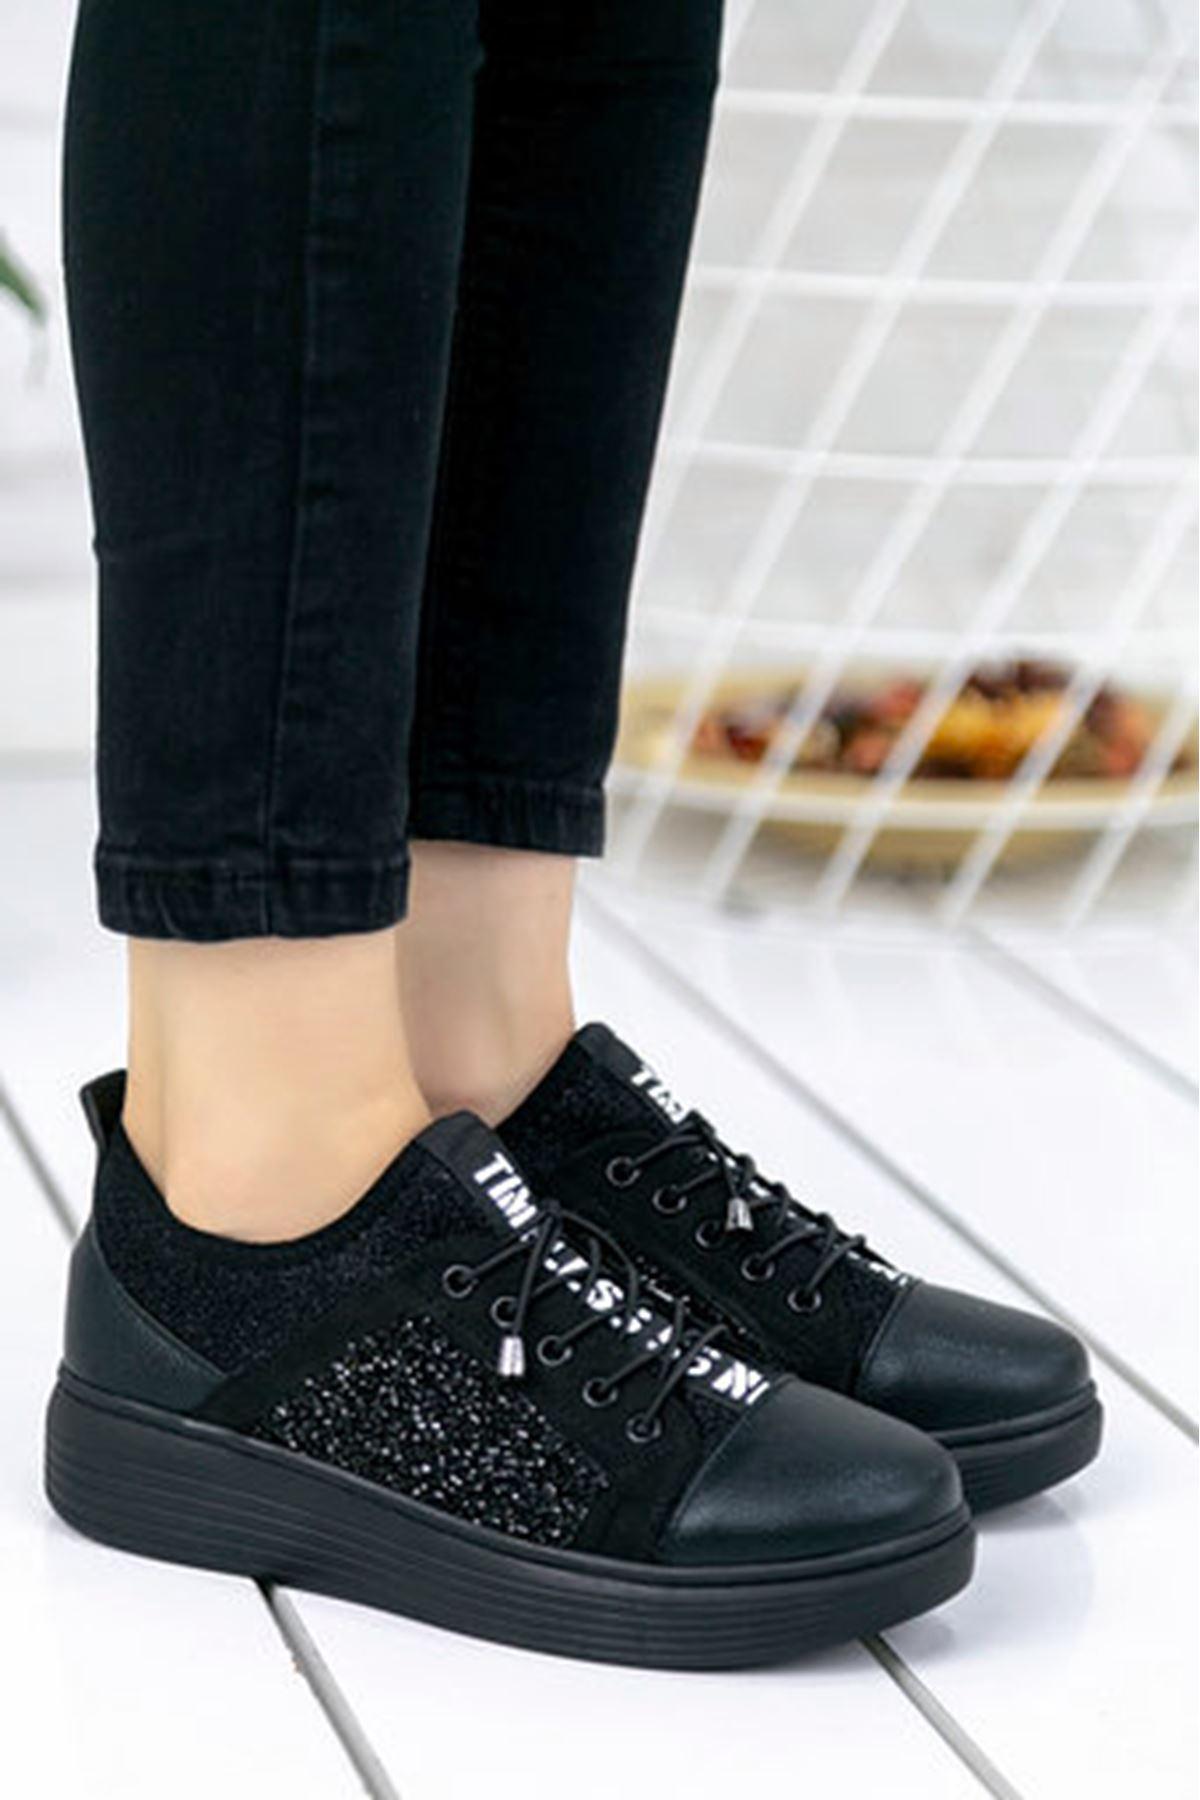 Cappi Rugan Taş Detay Dalgıç Kumaş Spor Ayakkabı Siyah